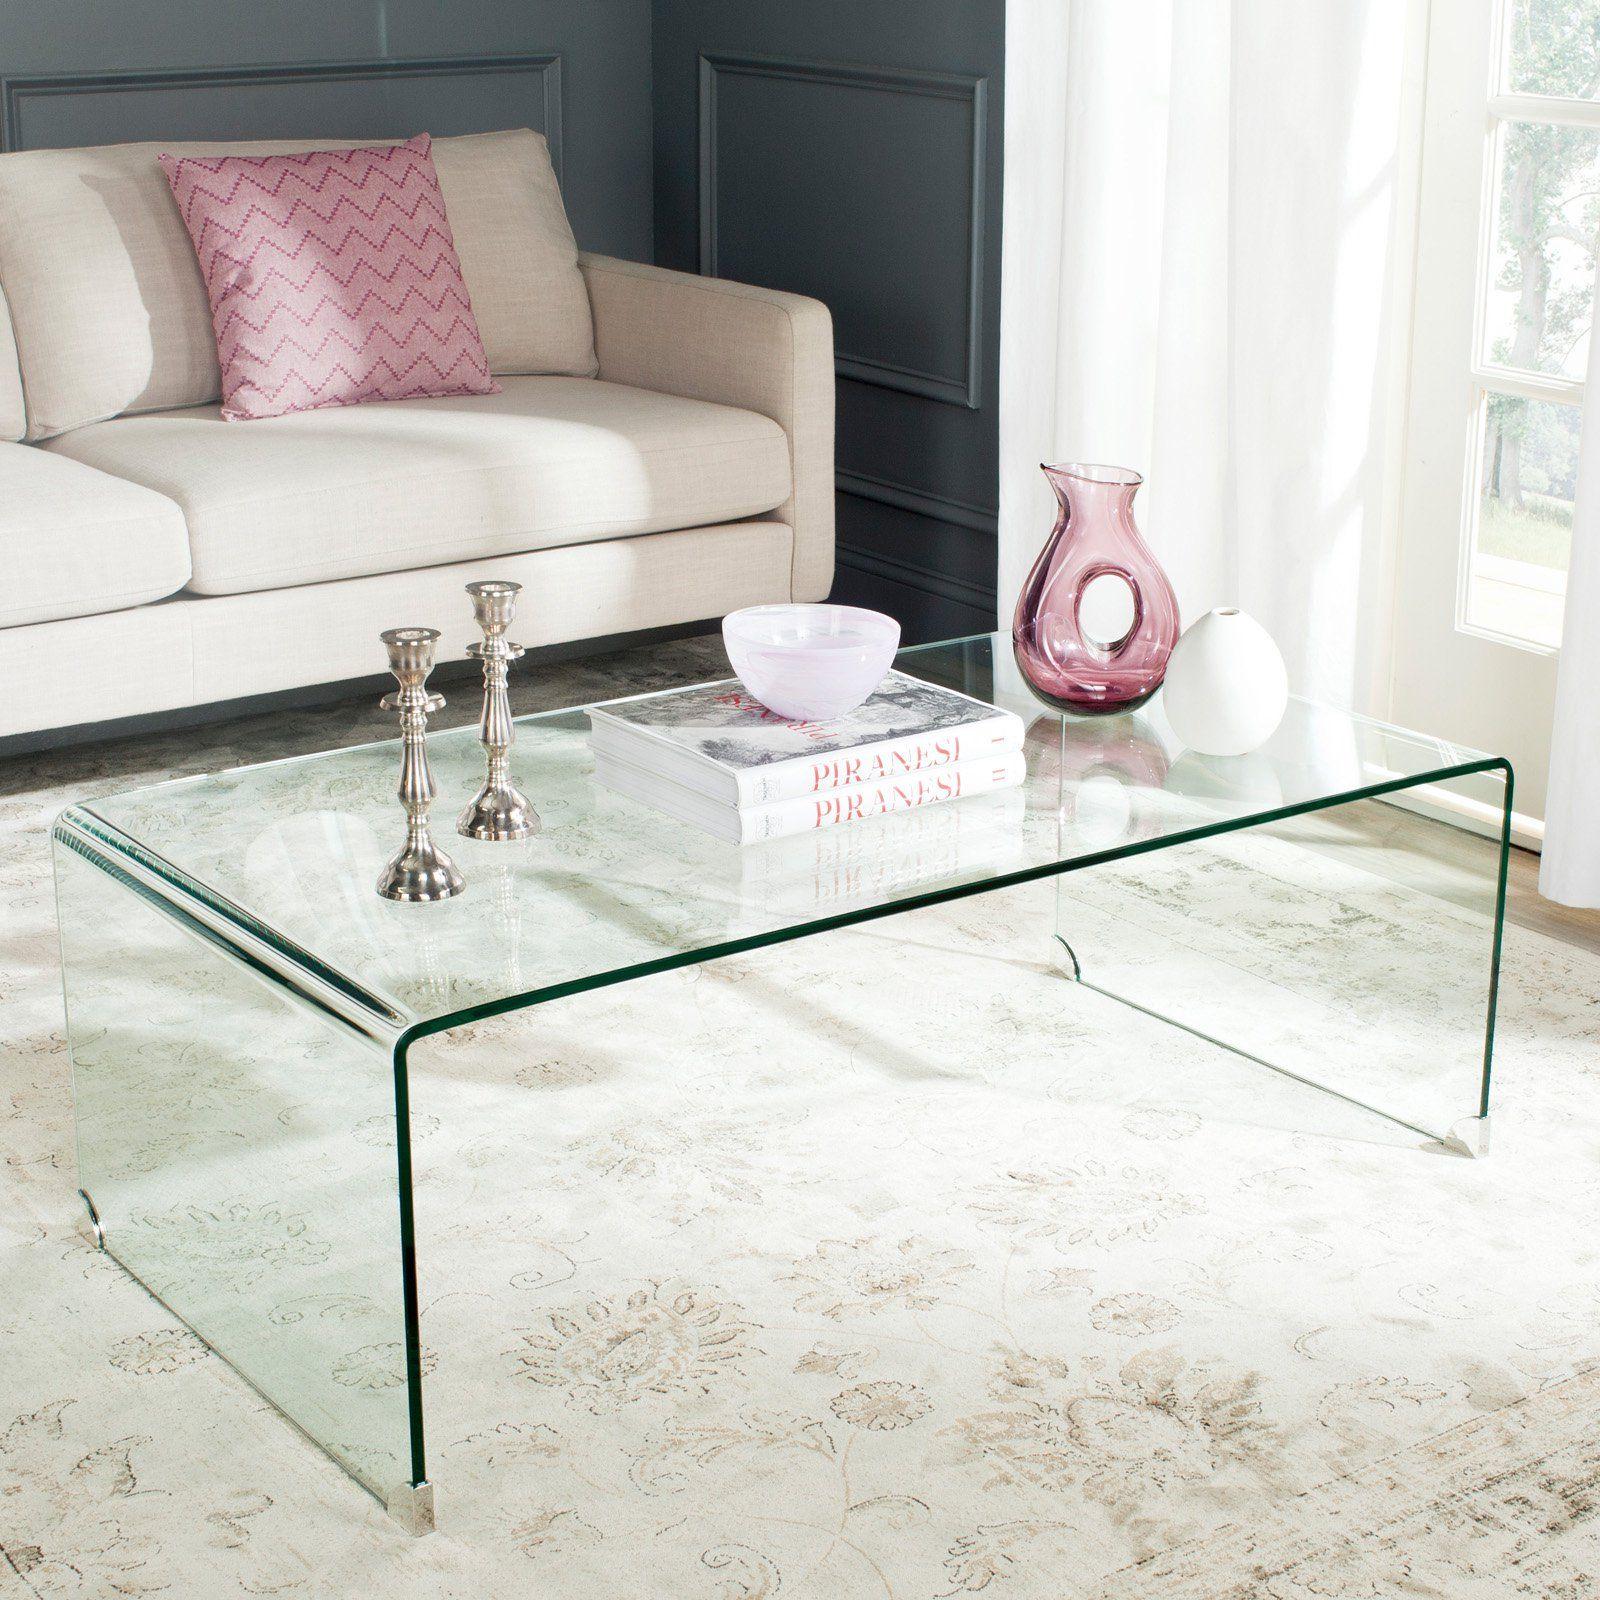 Safavieh Willow Coffee Table Walmart Com Walmart Com Modern Glass Coffee Table Coffee Table Clear Coffee Table [ 1600 x 1600 Pixel ]